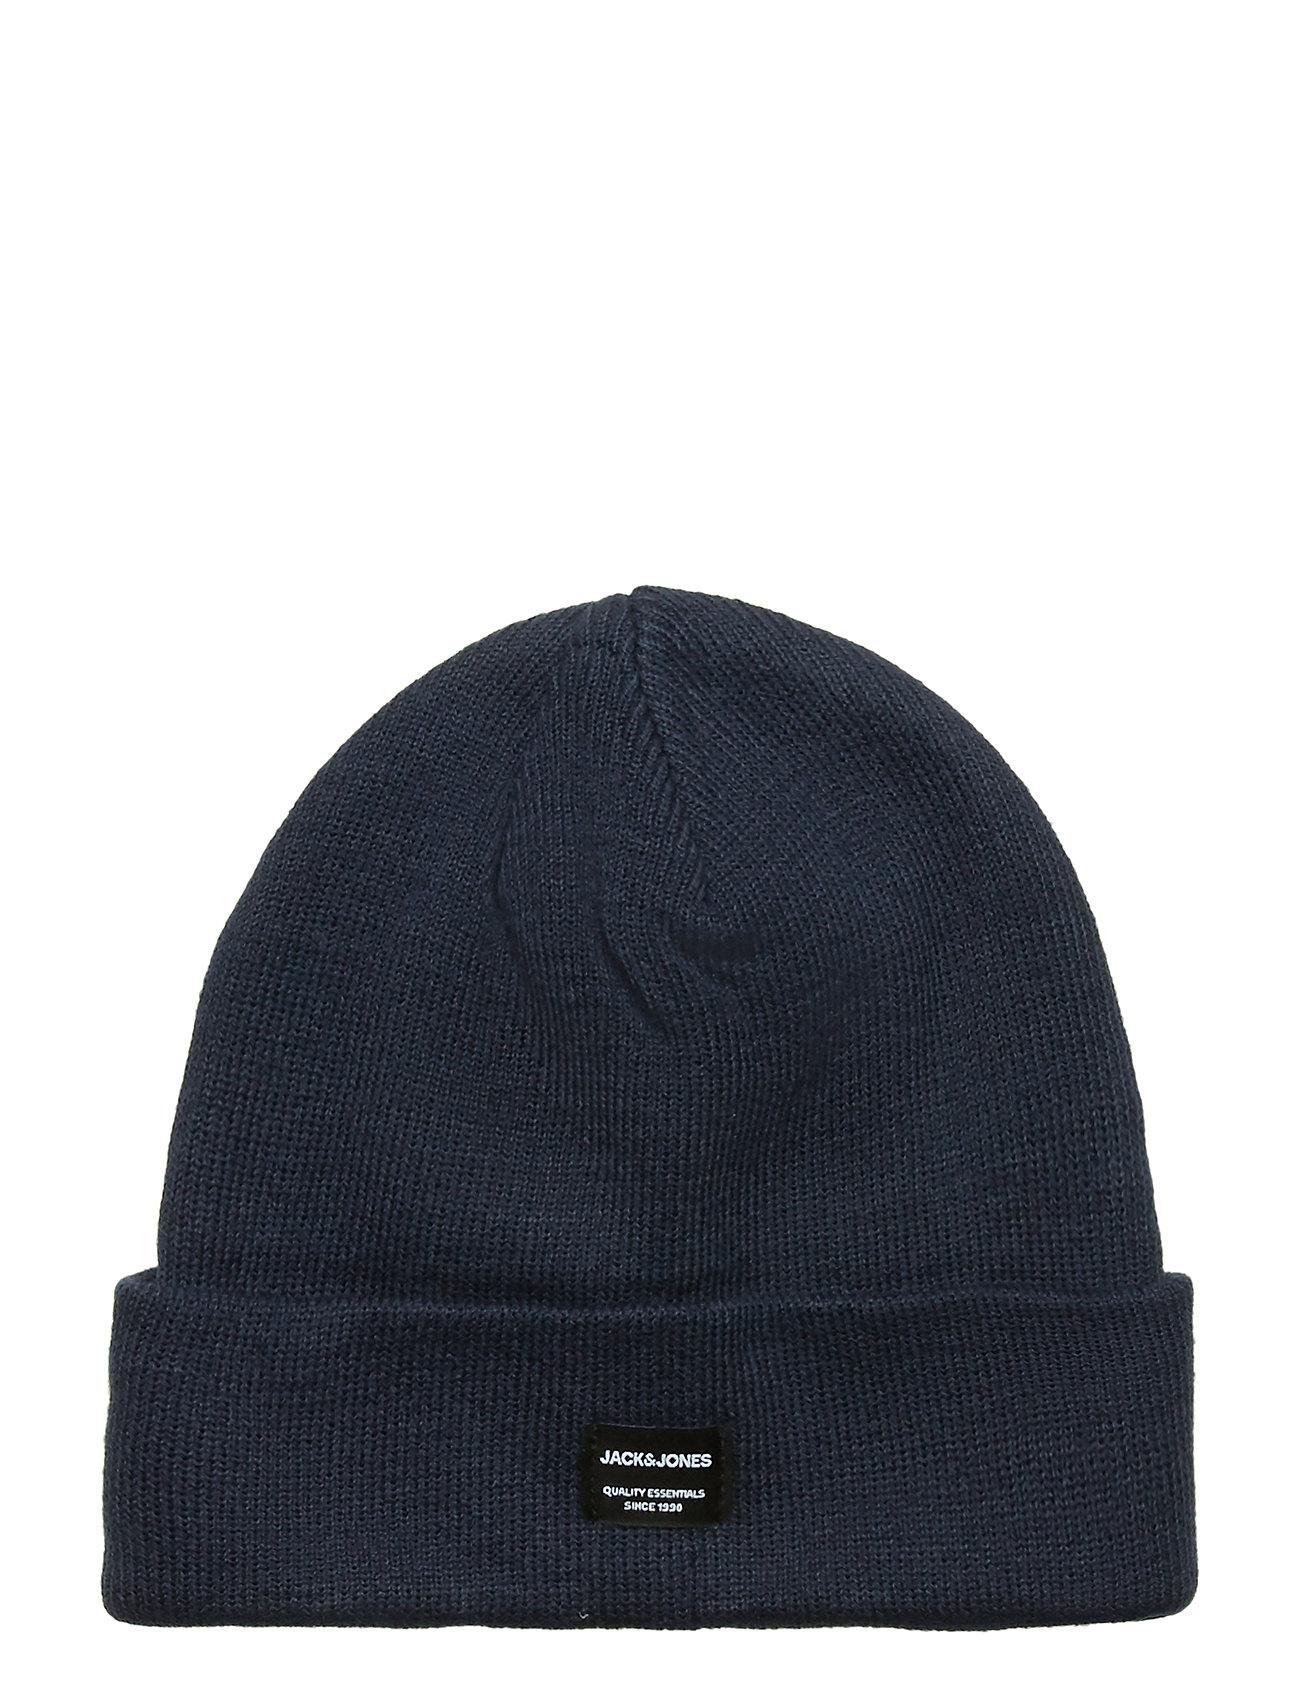 Image of Jacdna Beanie Noos Accessories Hats & Caps Beanies Blå Jack & J S (3213733549)